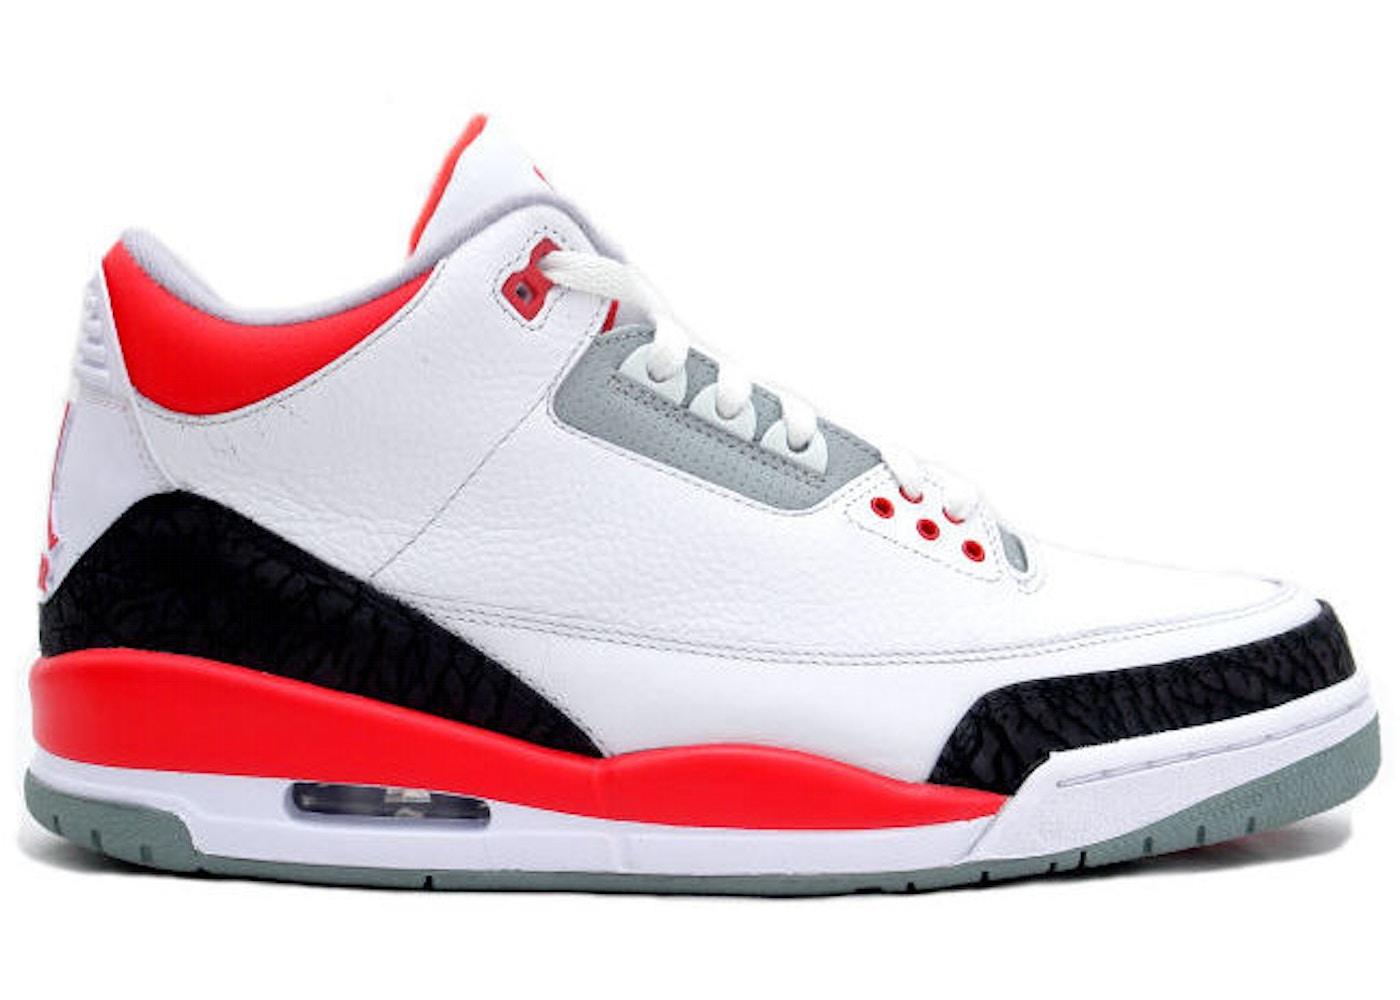 online store f507d 80004 Jordan 3 OG Fire Red (1988) - 4367